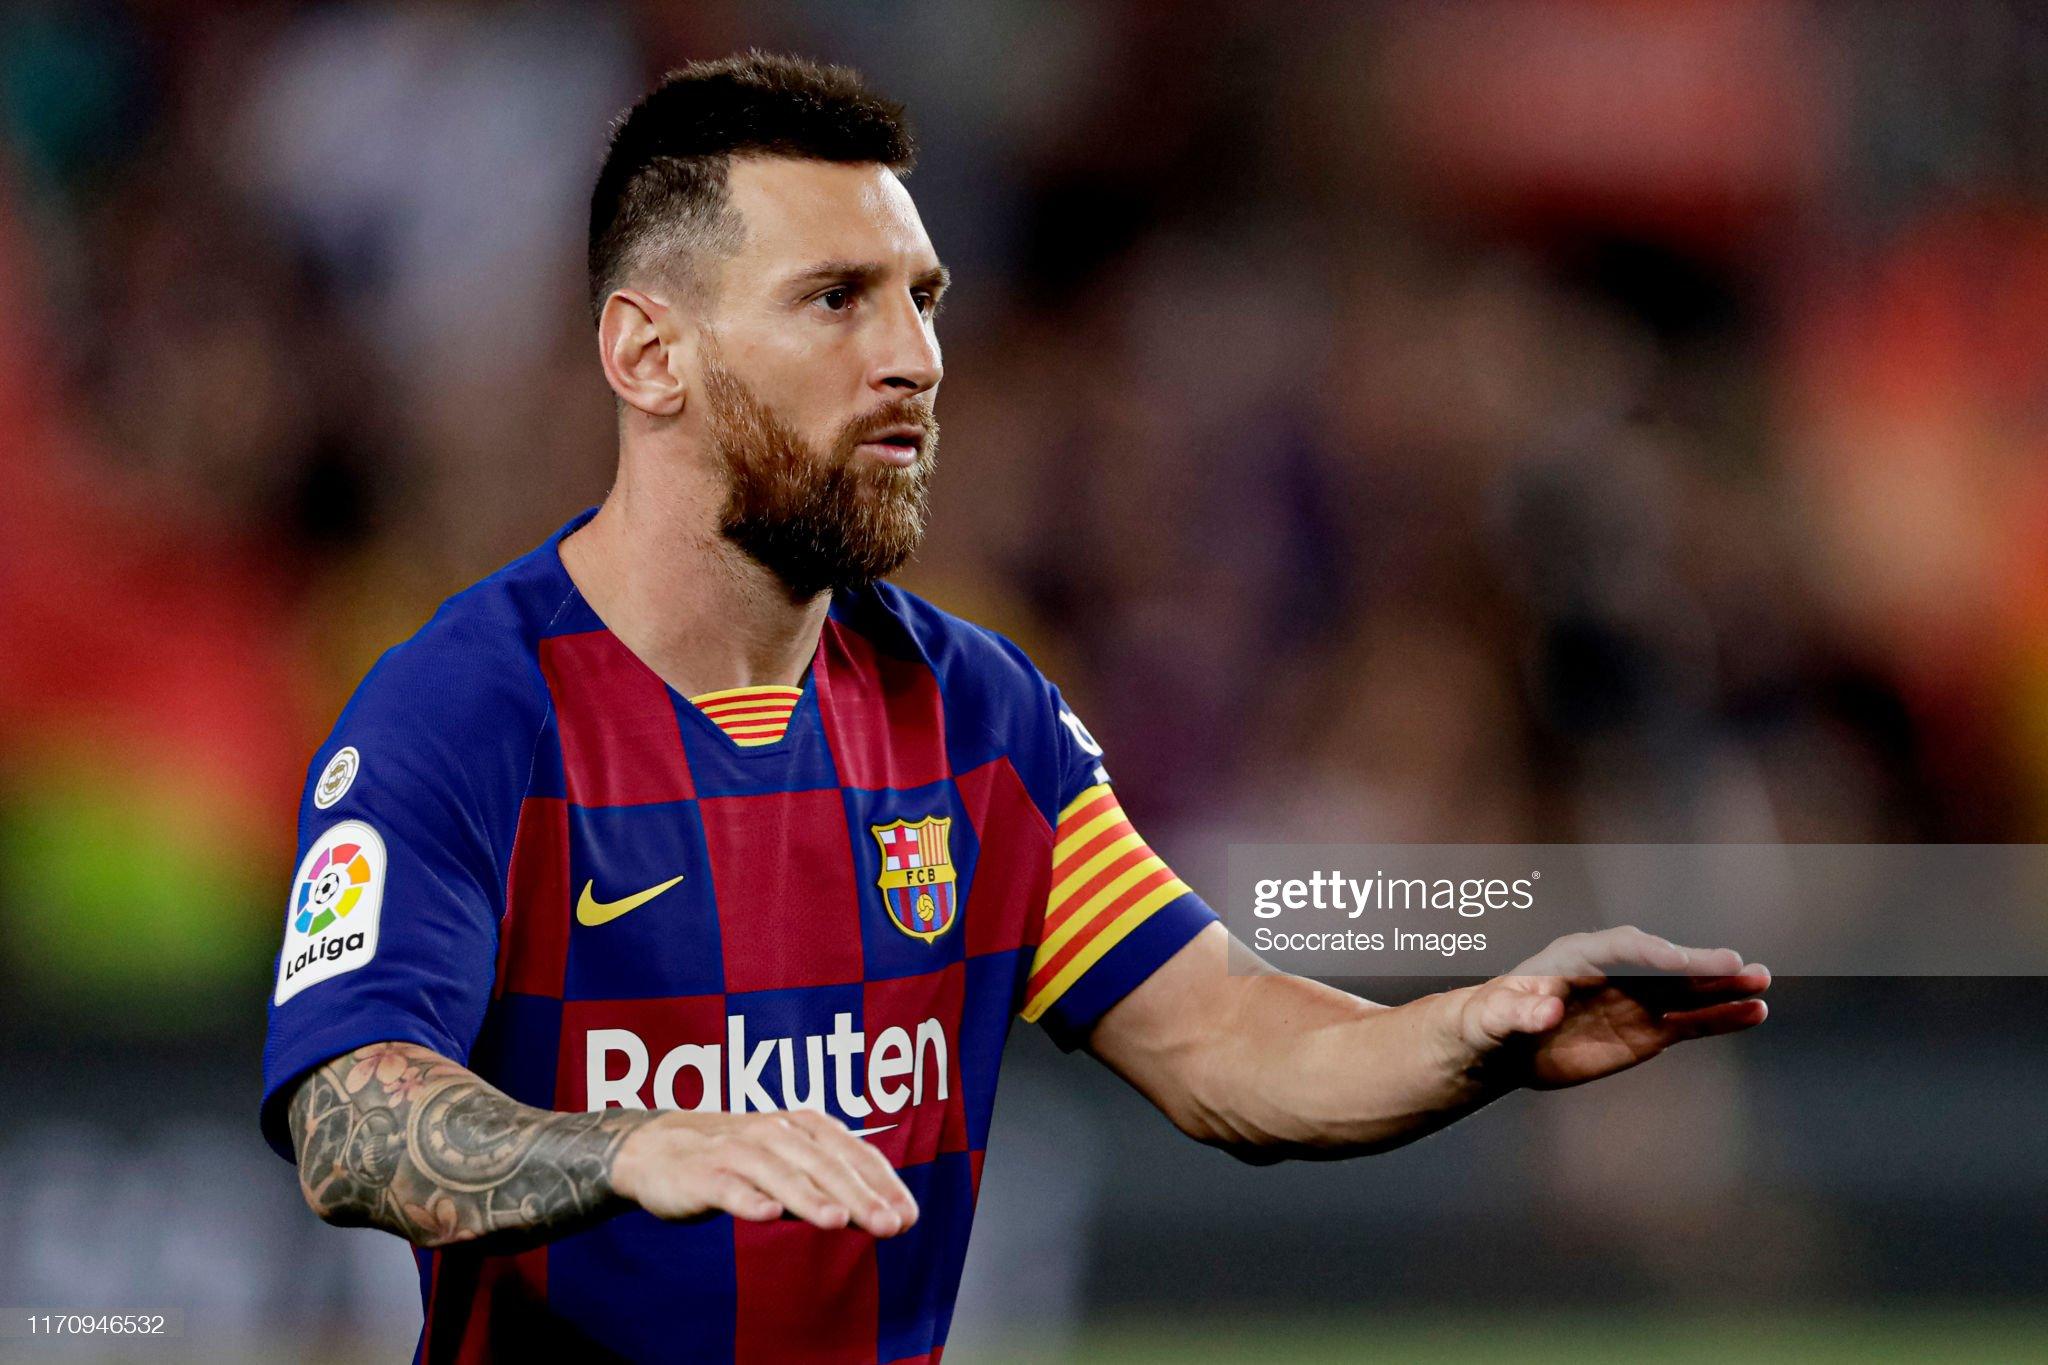 صور مباراة : برشلونة - فياريال 2-1 ( 24-09-2019 )  Lionel-messi-of-fc-barcelona-during-the-la-liga-santander-match-fc-picture-id1170946532?s=2048x2048